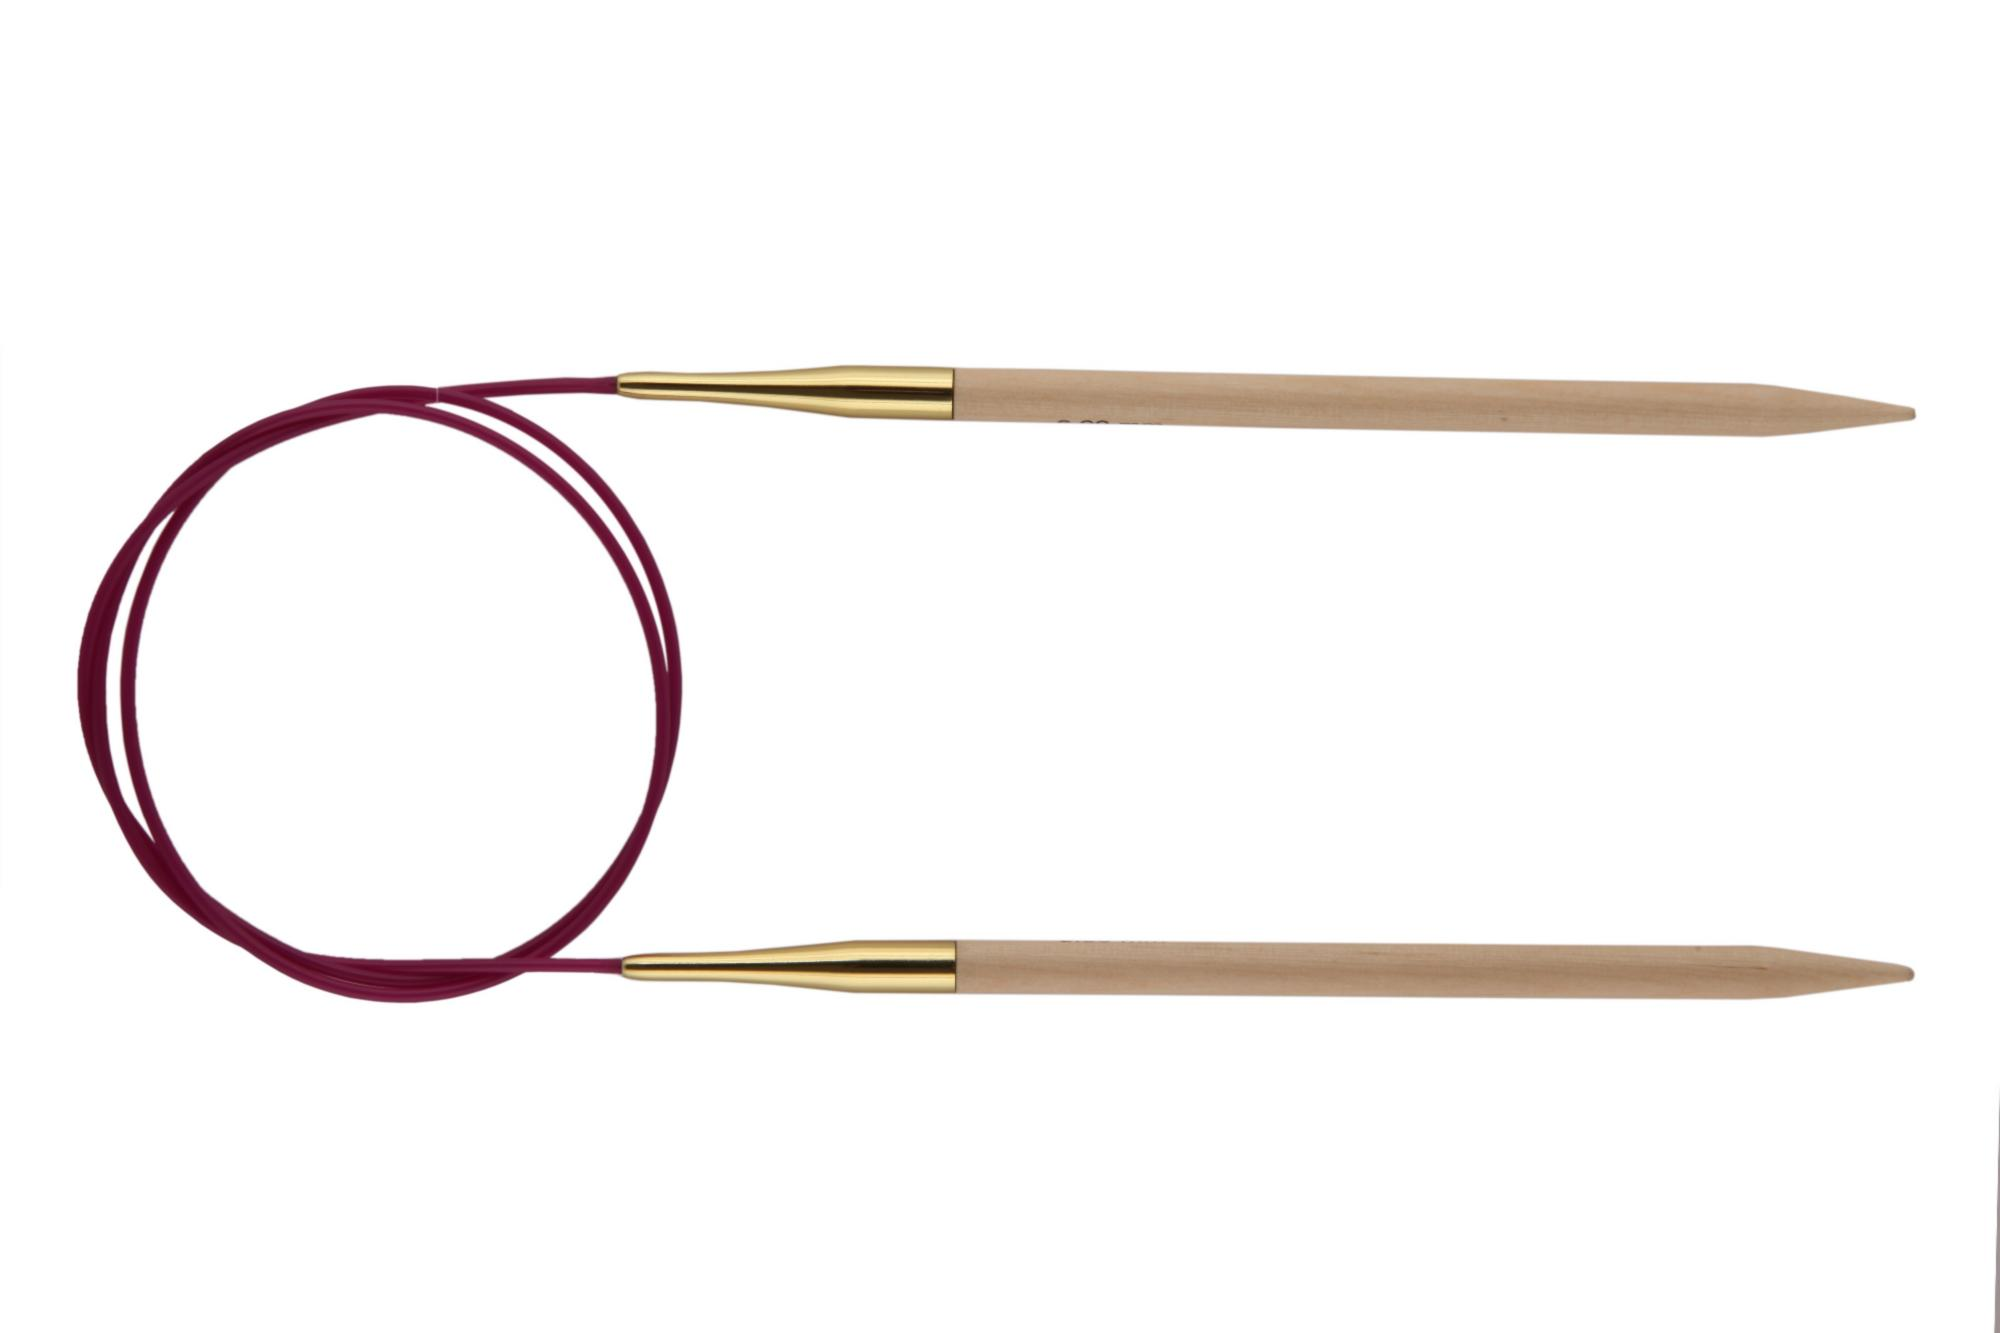 Спицы круговые 40 см Basix Birch Wood KnitPro, 35312, 6.00 мм